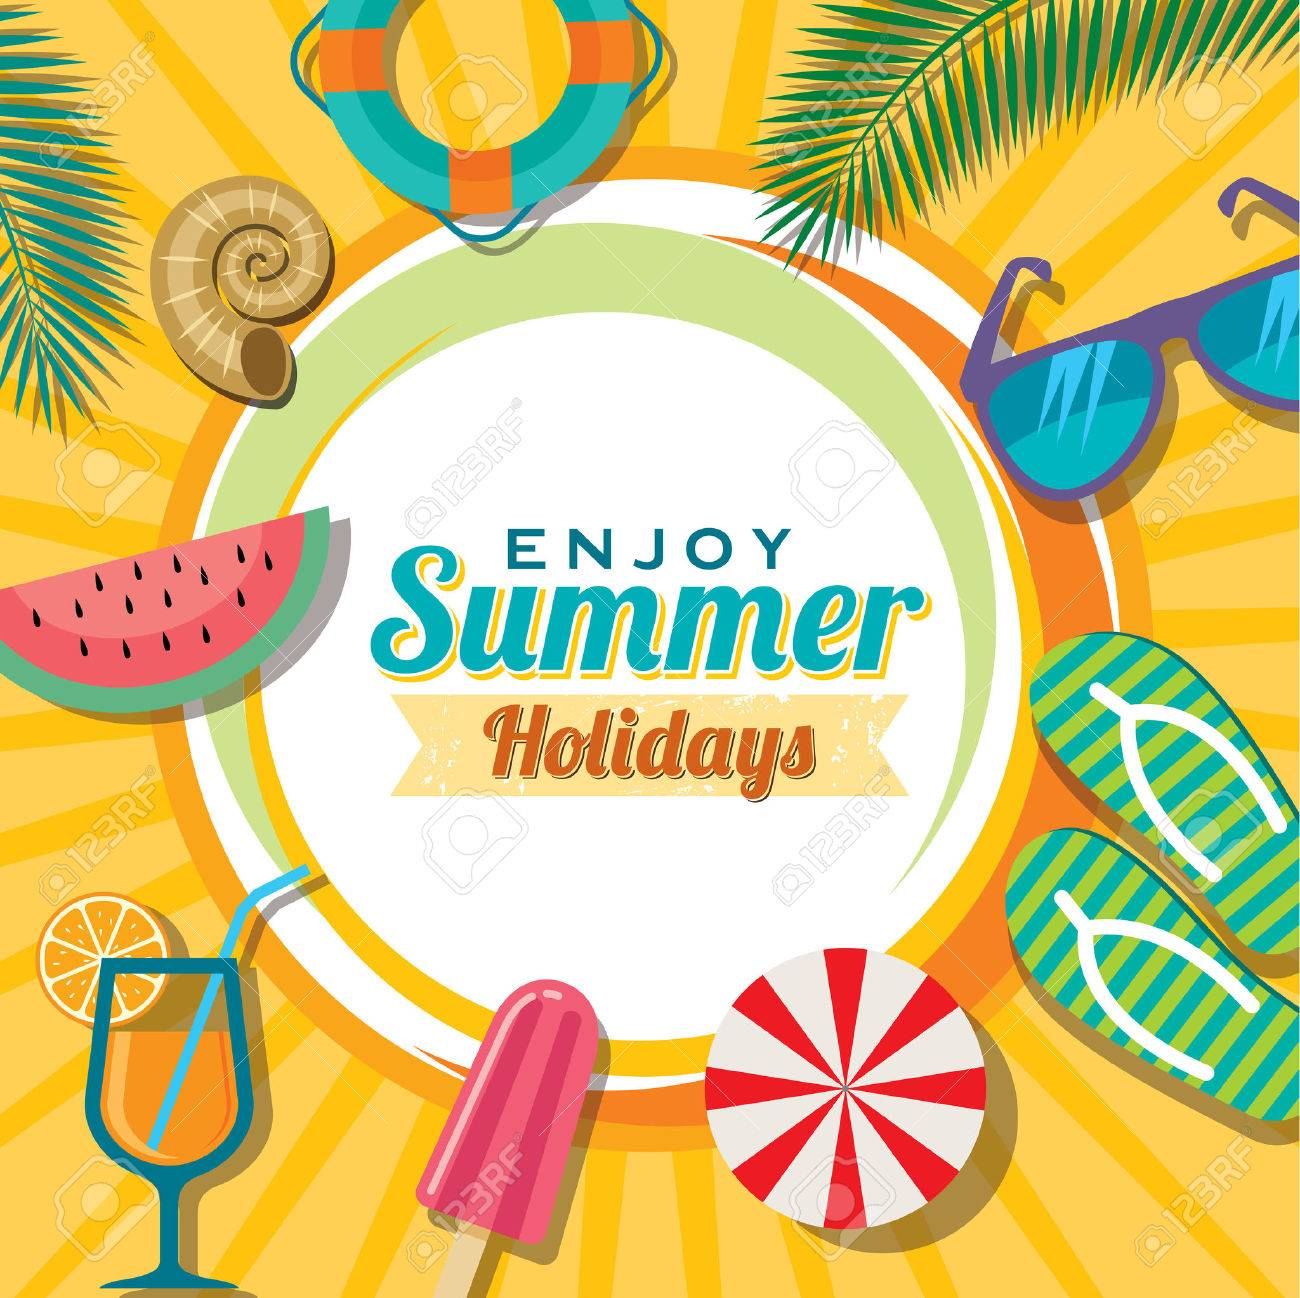 Summer holidays illustration  summer background Standard-Bild - 39942457